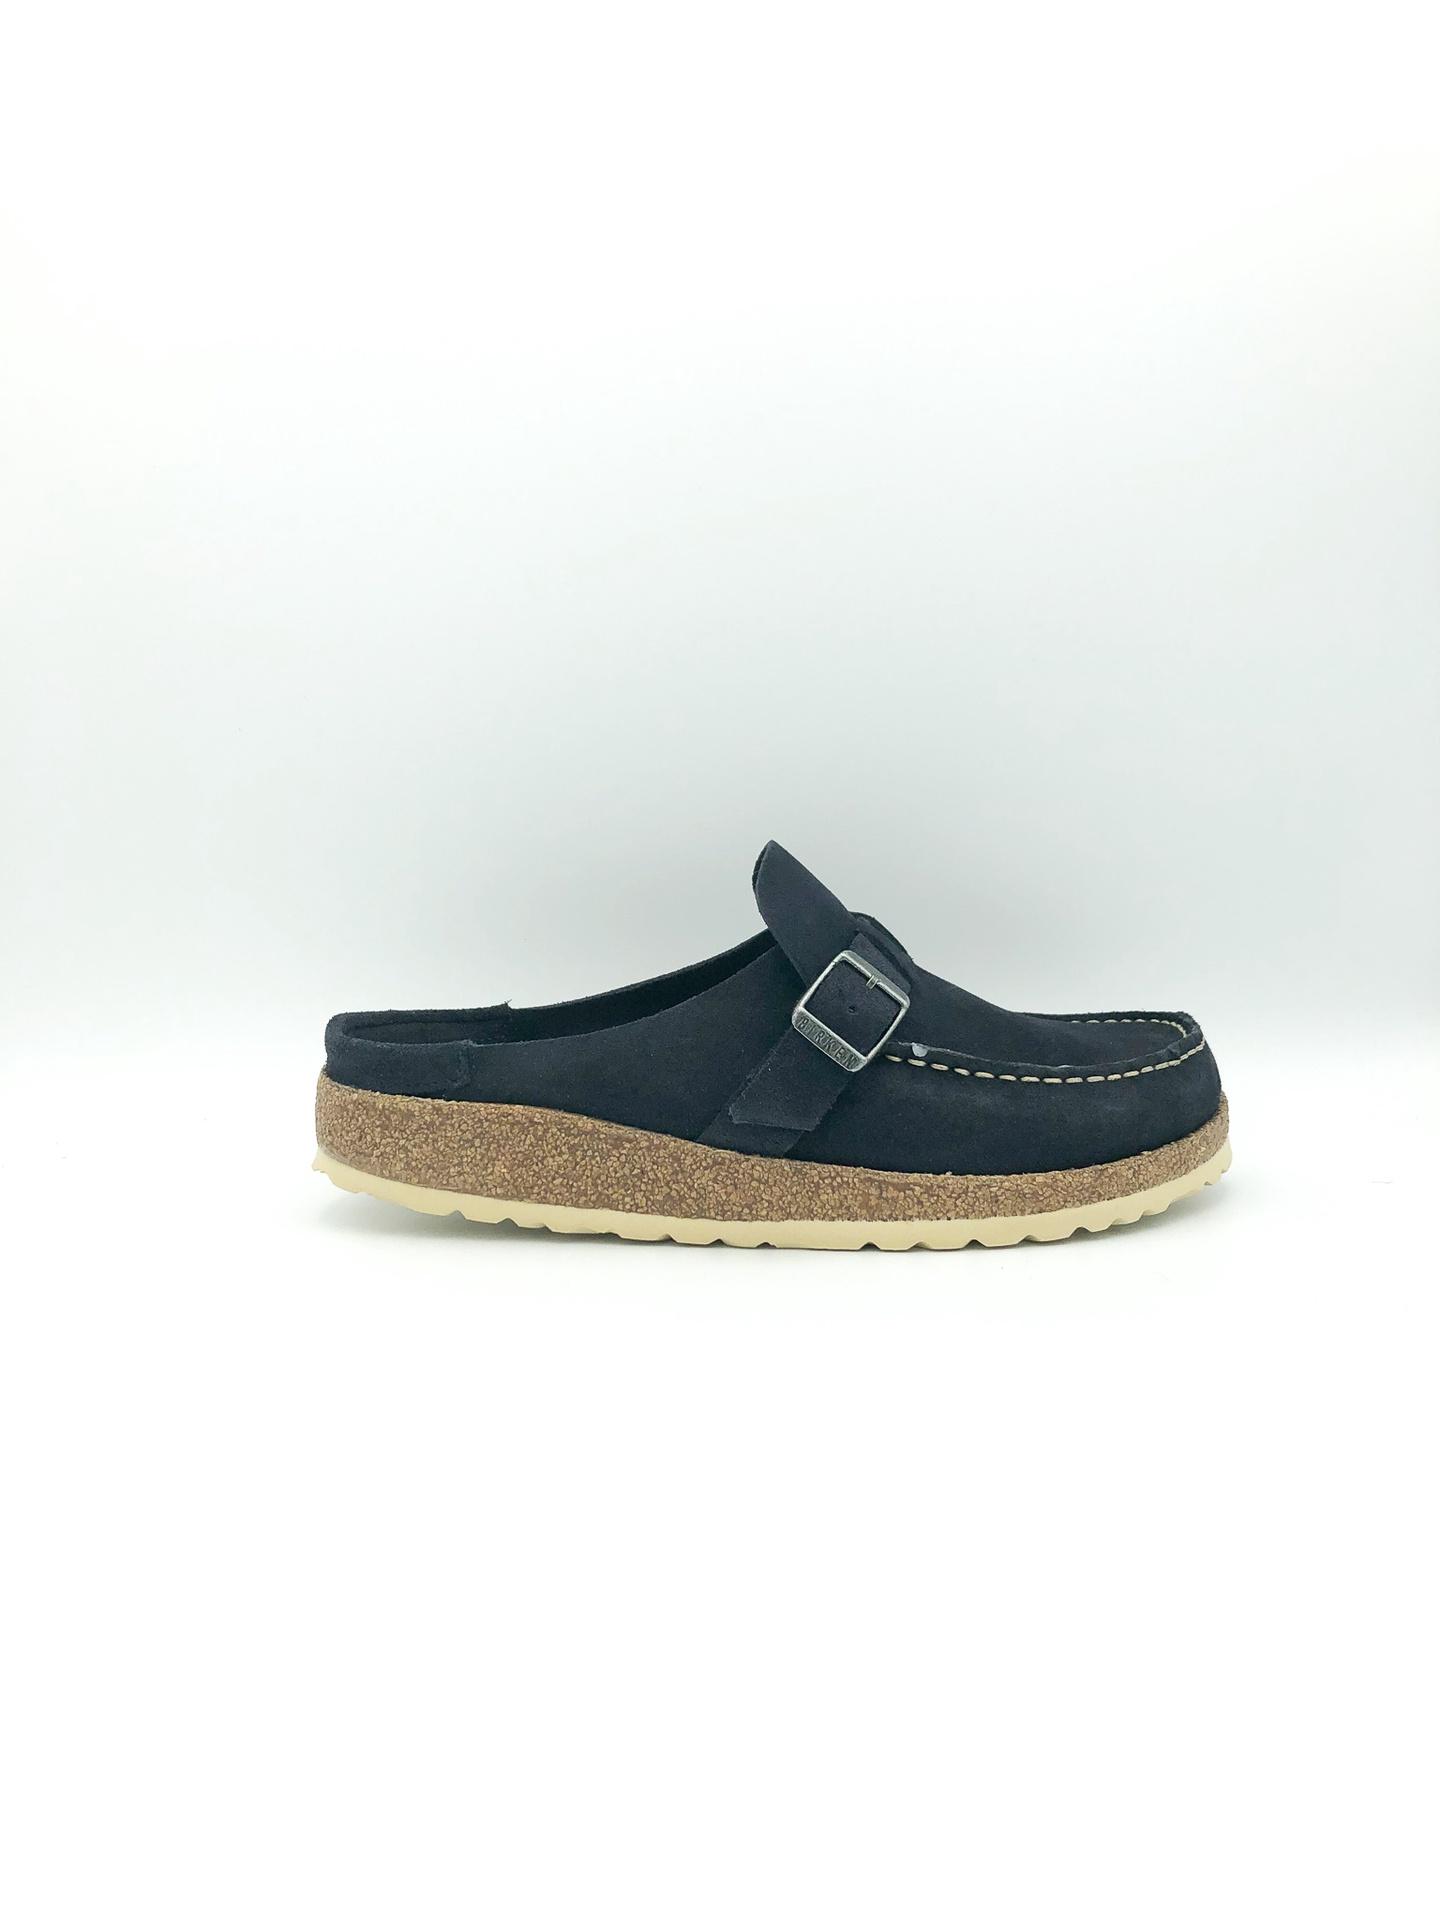 258dd5be6354 MICHAEL KORS - SHELLY FLAT SANDAL IN BLACK - the Urban Shoe Myth